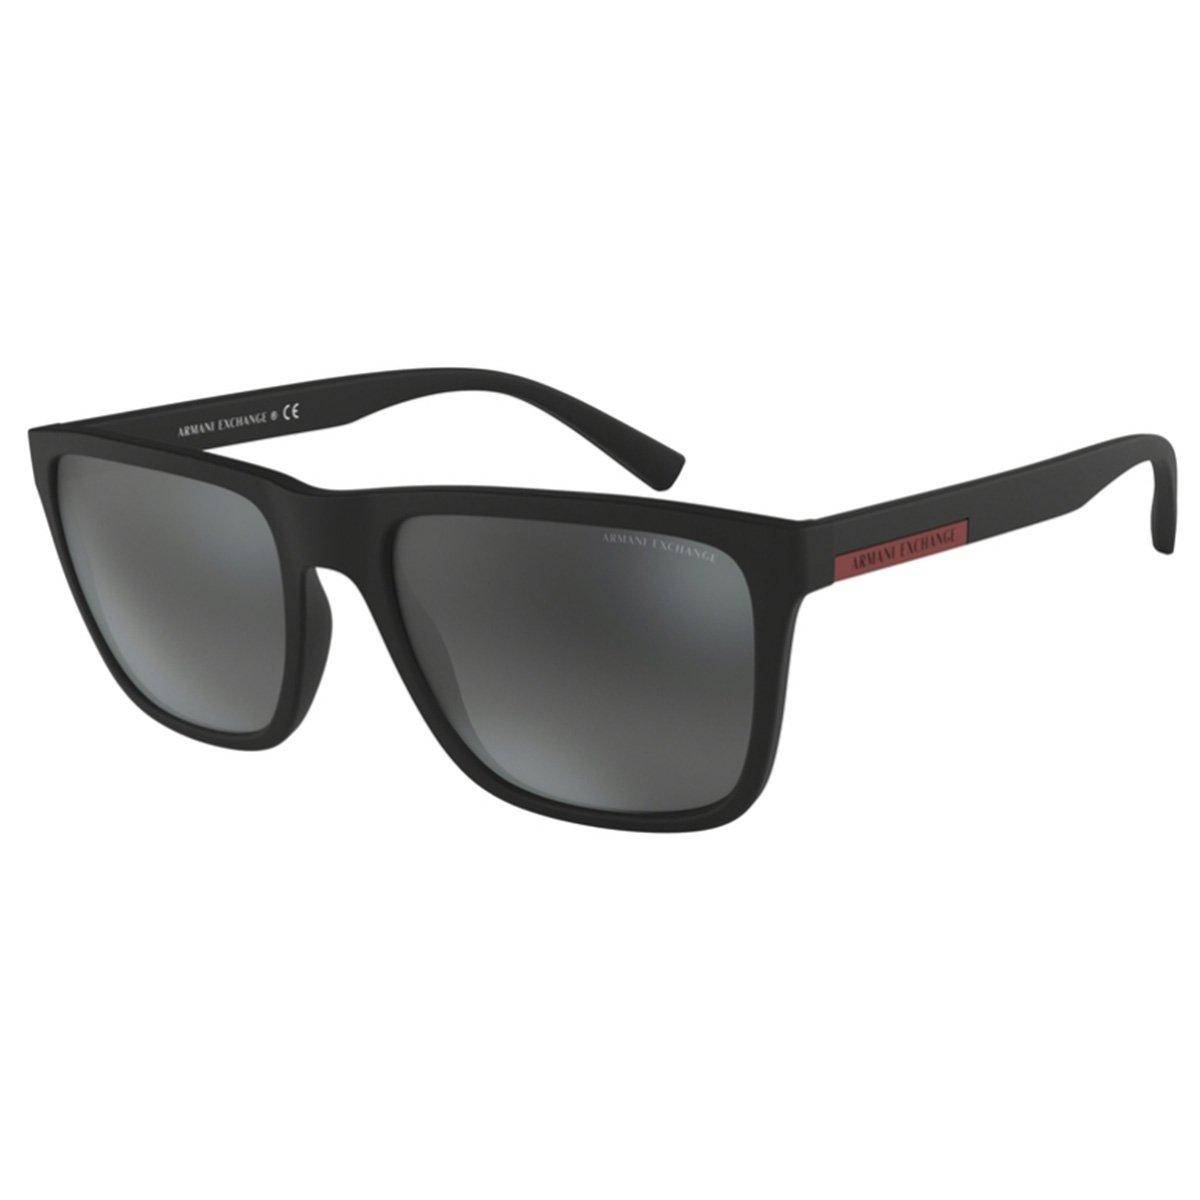 3caab7483e59a Compre Óculos de Sol Armani Exchange em 10X   Tri-Jóia Shop